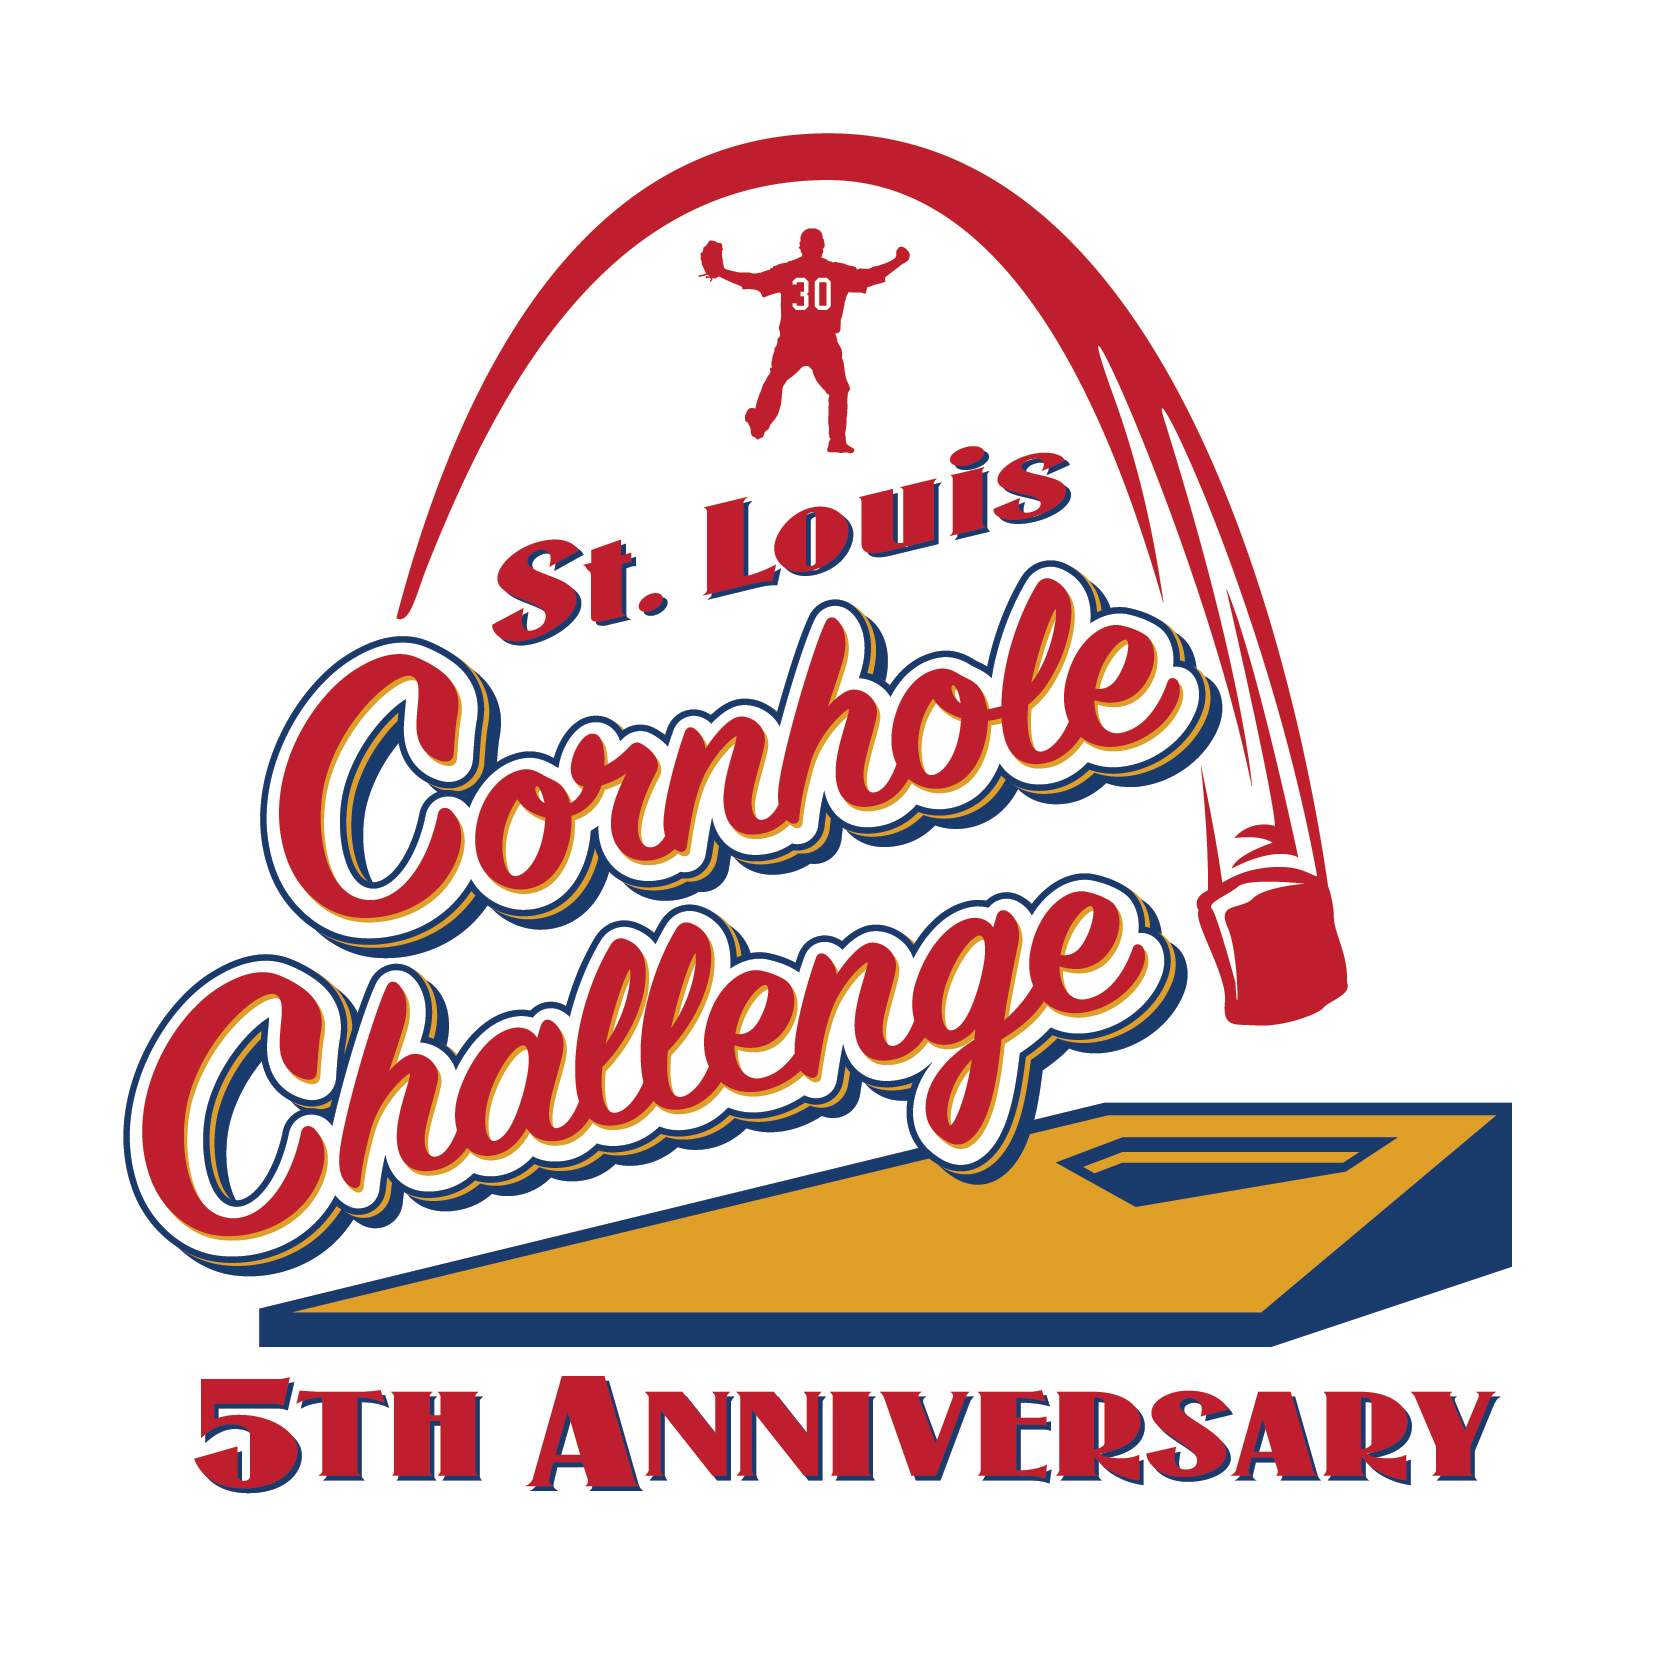 2018 Cornhole Challenge Logo